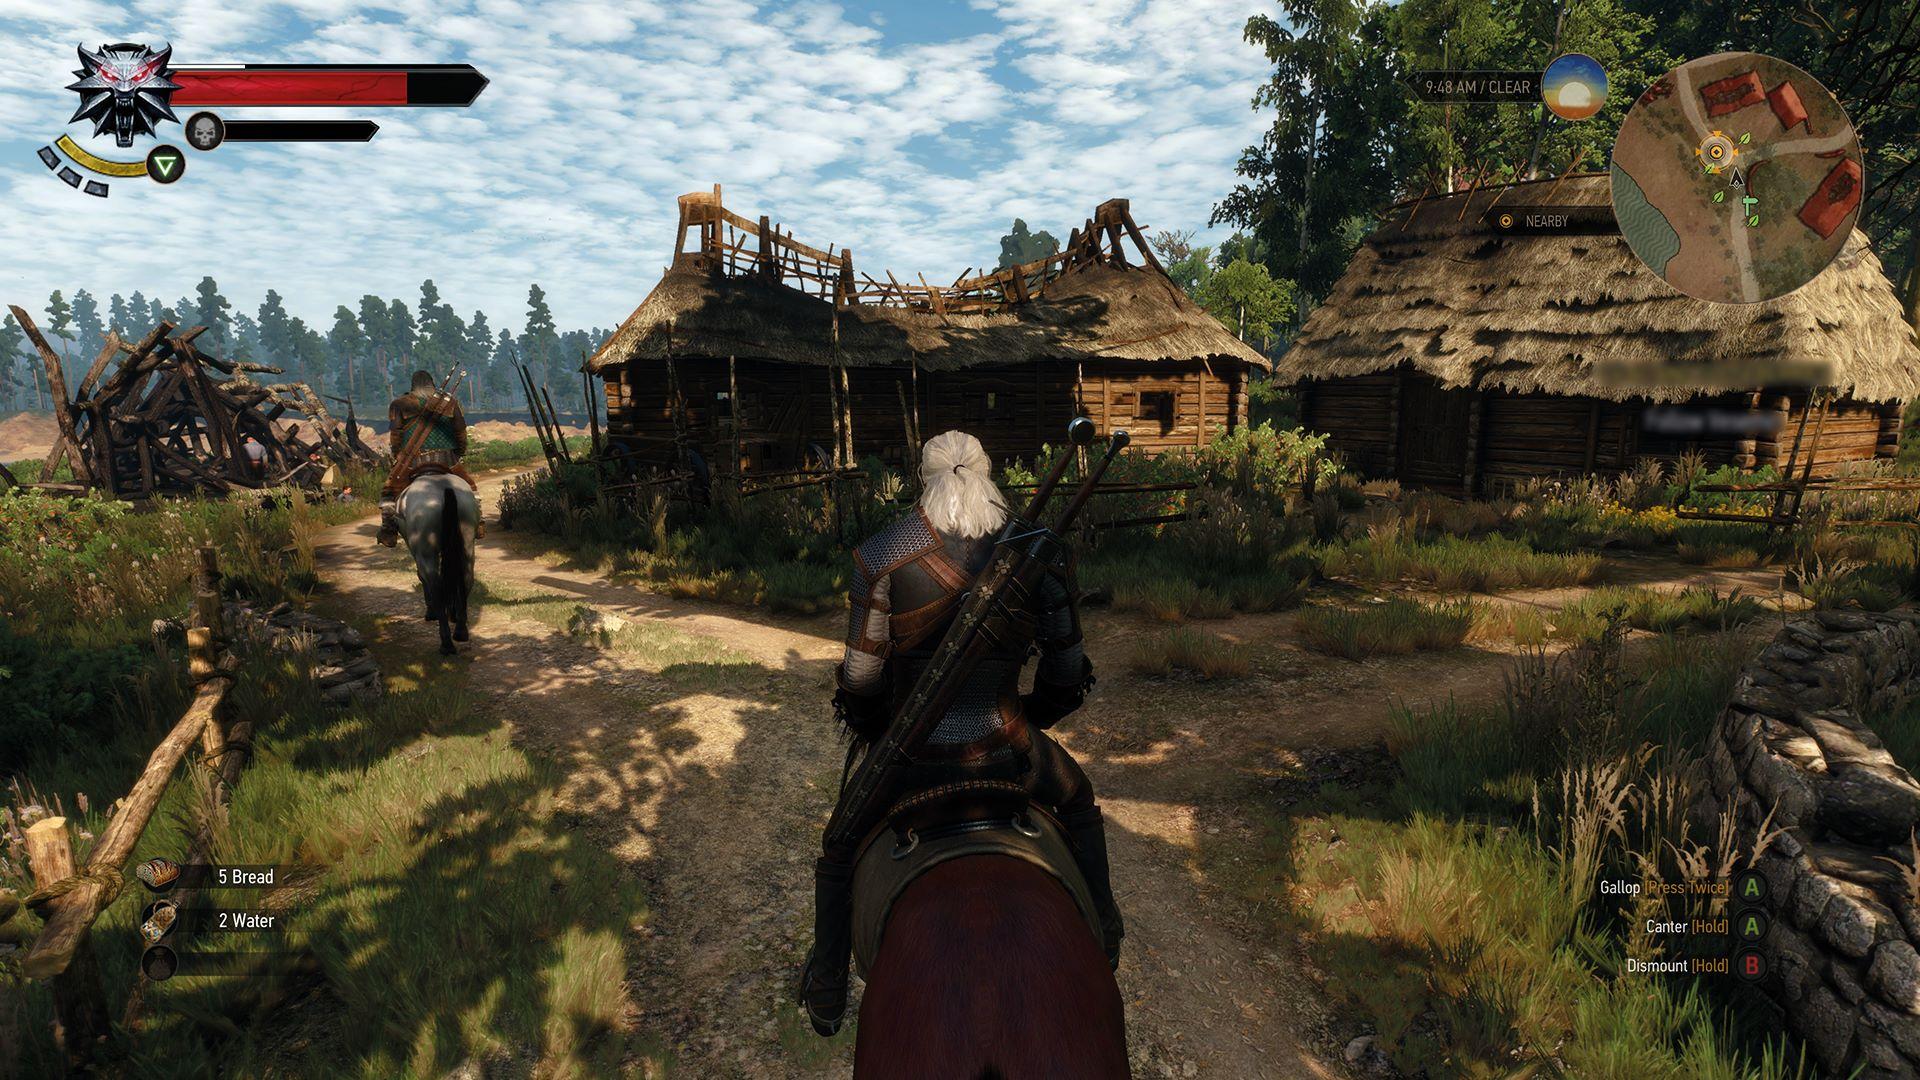 The Witcher's Geralt riding a horse